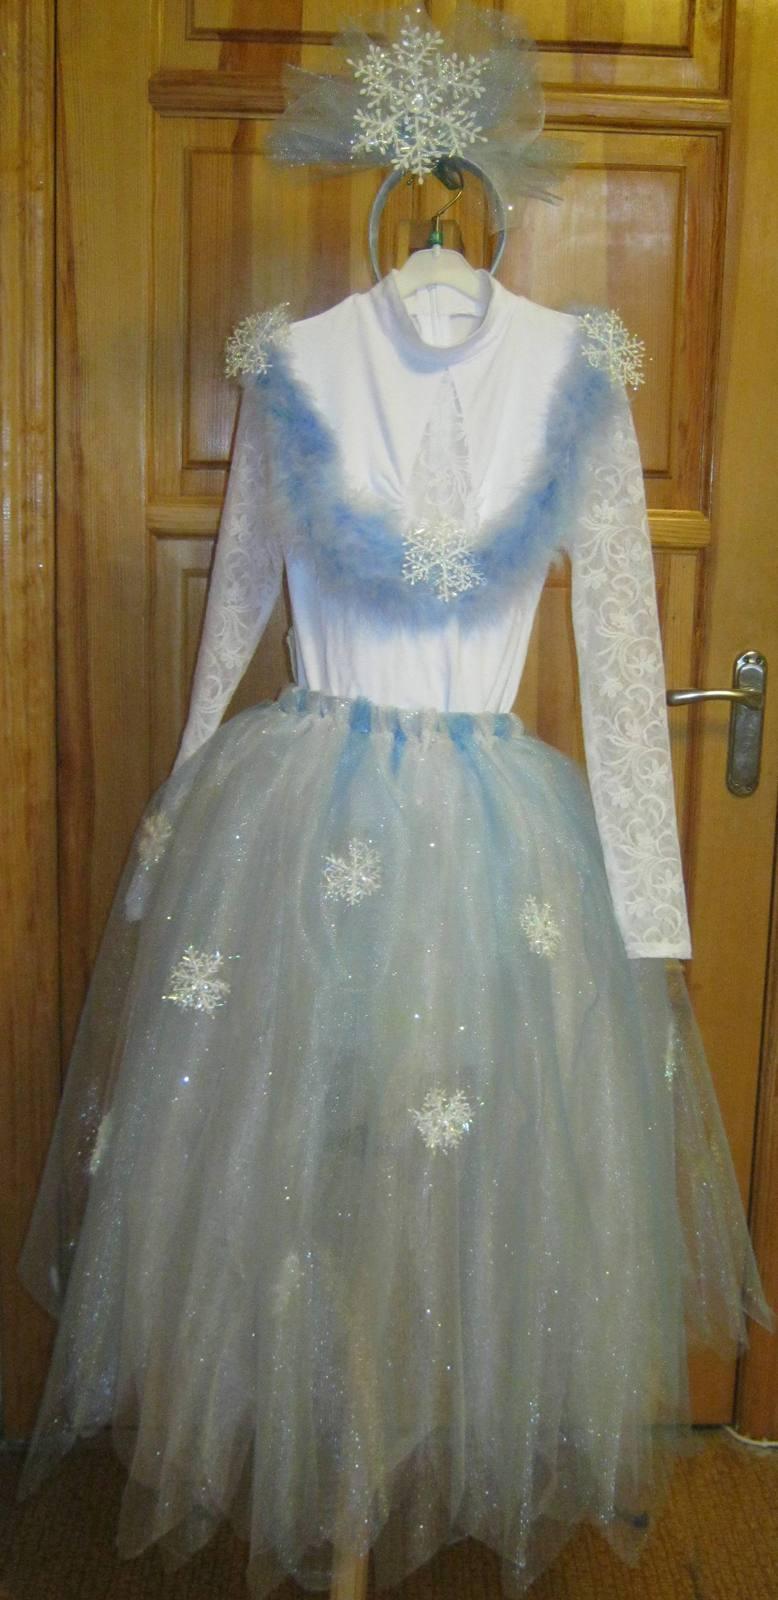 Продам: Новогодний костюм. Снежинка - Купить: Новогодний ... - photo#20